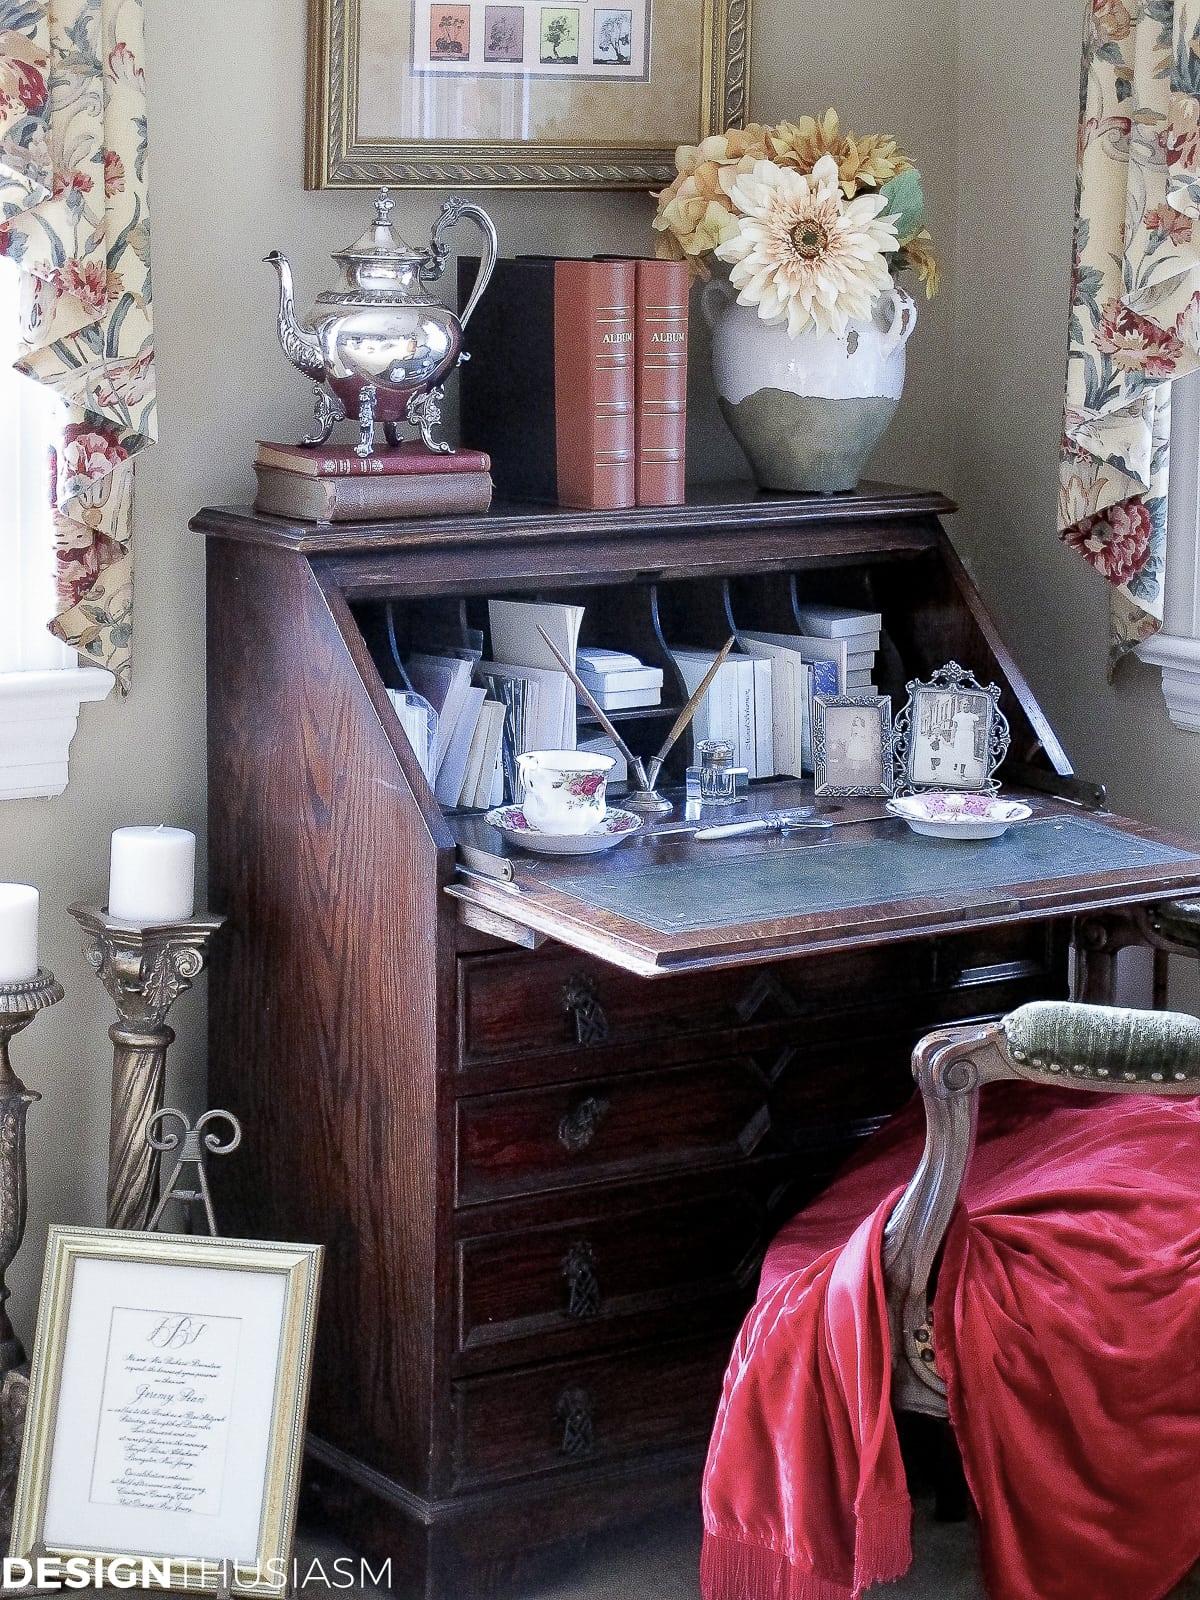 Tis Autumn Living Room Fall Decor Ideas: Autumn Decor: 10 Ways To Use Fall Decorations Throughout